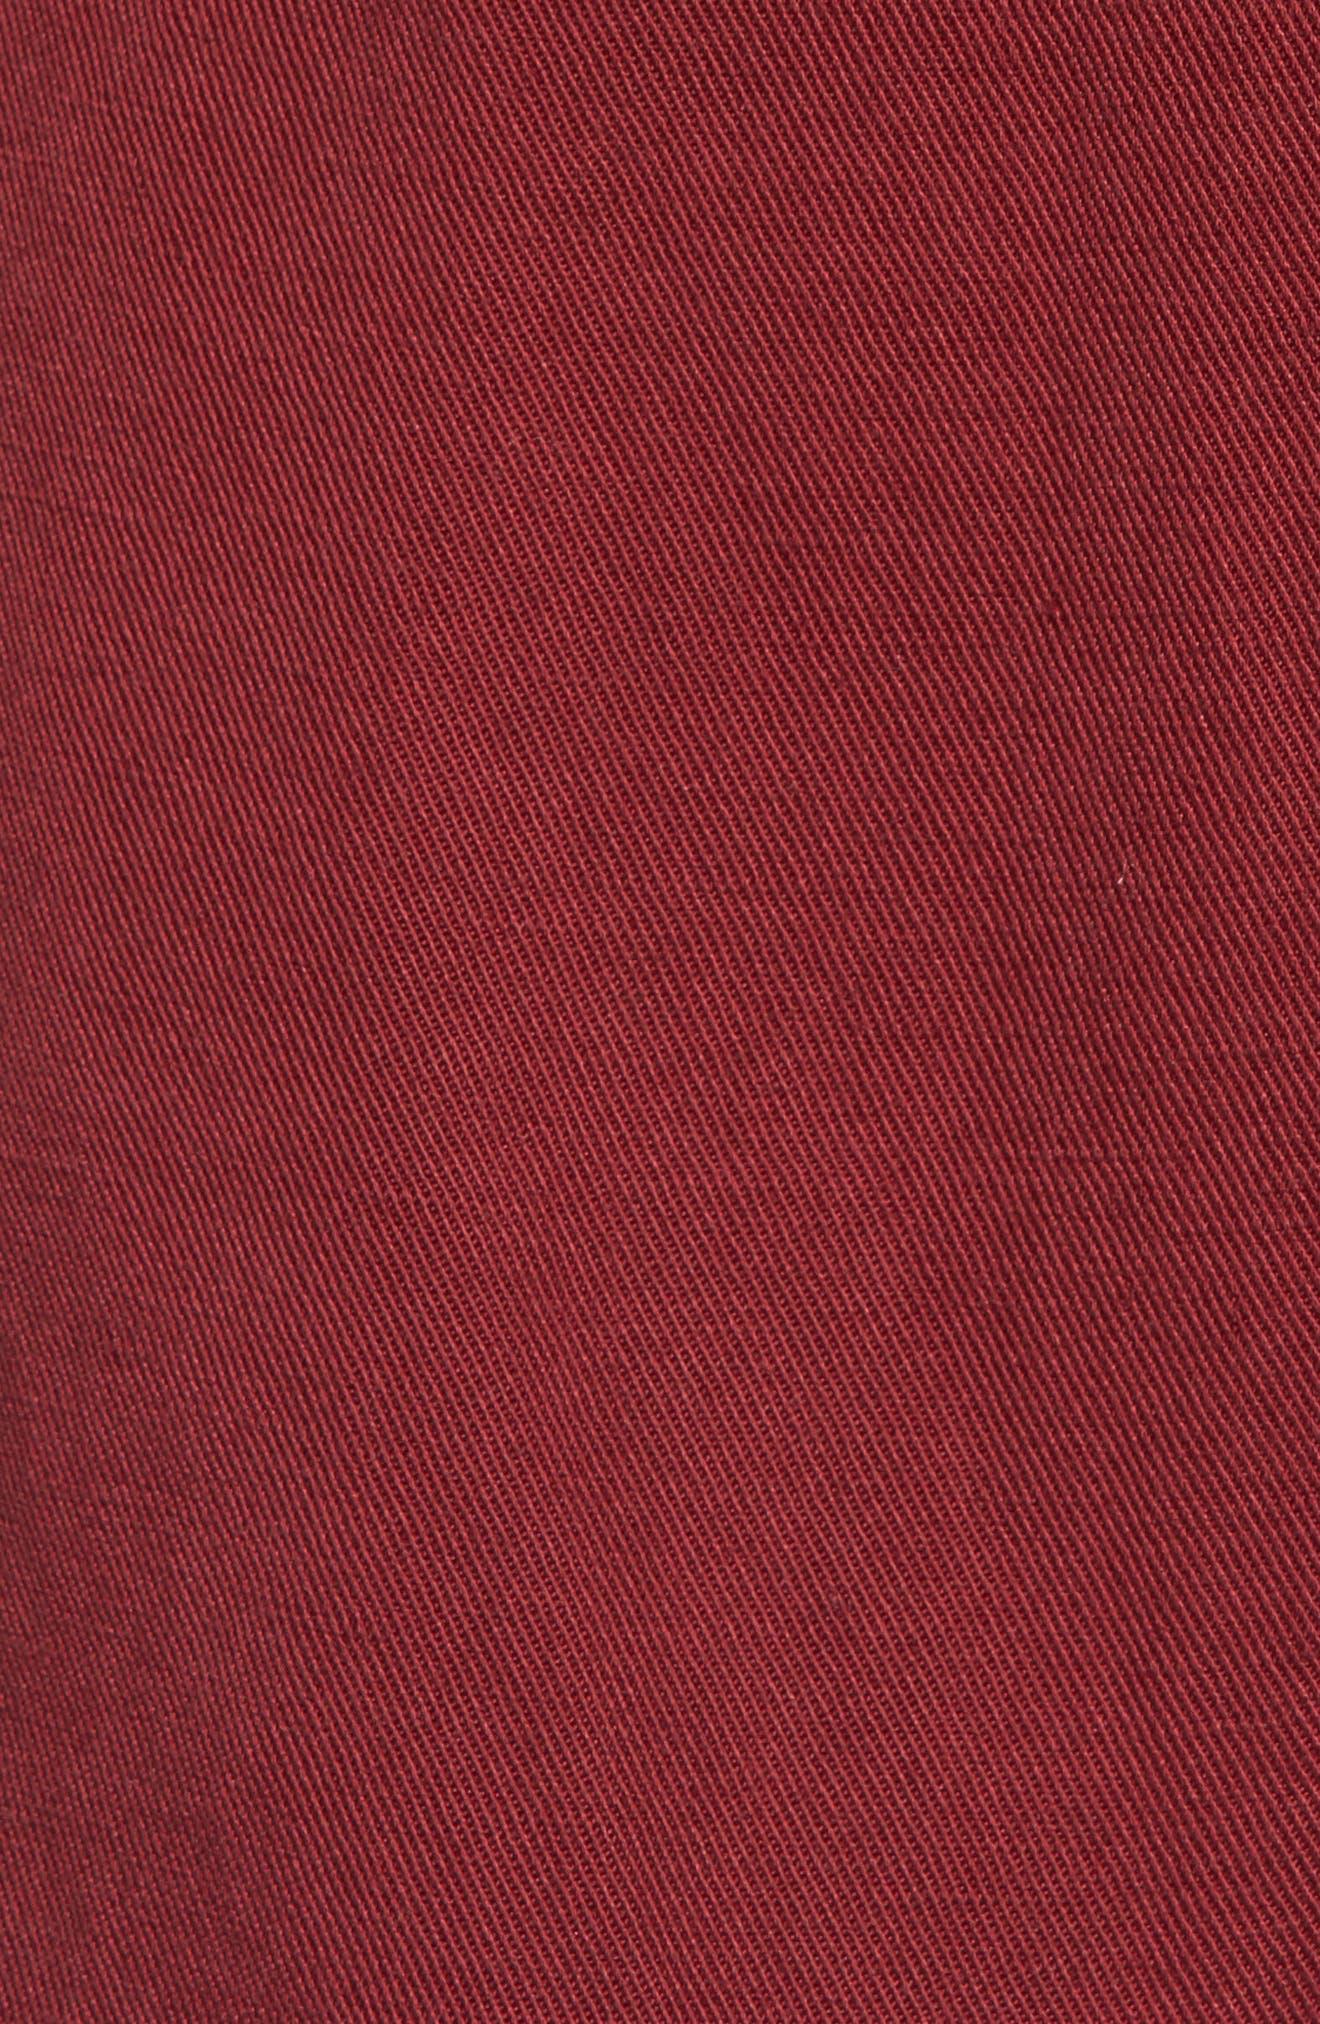 Maverick Military Jacket,                             Alternate thumbnail 6, color,                             933